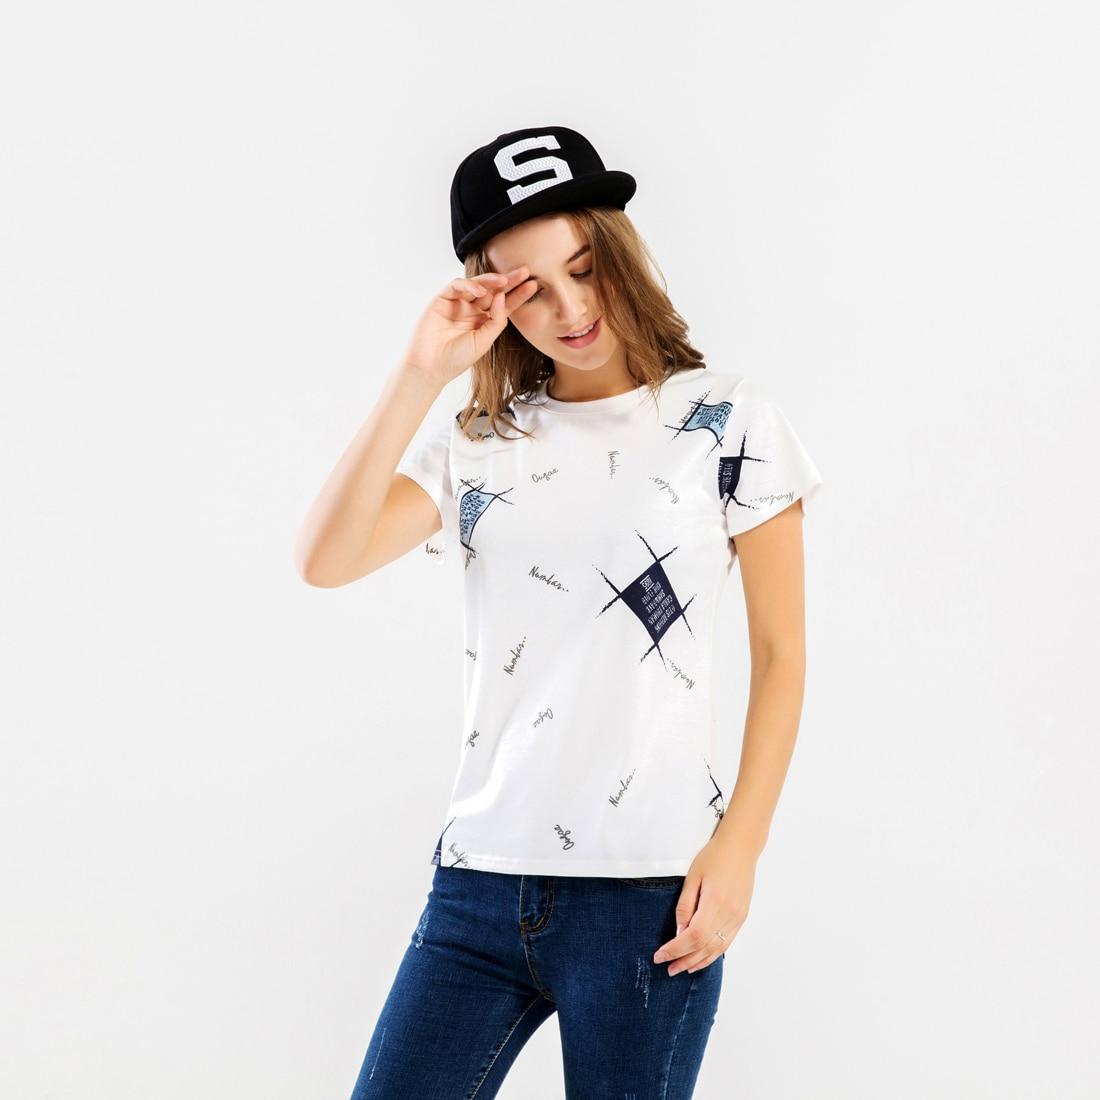 Fashion Streetwear Women's T-shirts 2019 New Hot Sale O-Neck Hip Hop T-shirt For Women Harajuku Brand-Clothing Tops Tees Shirt